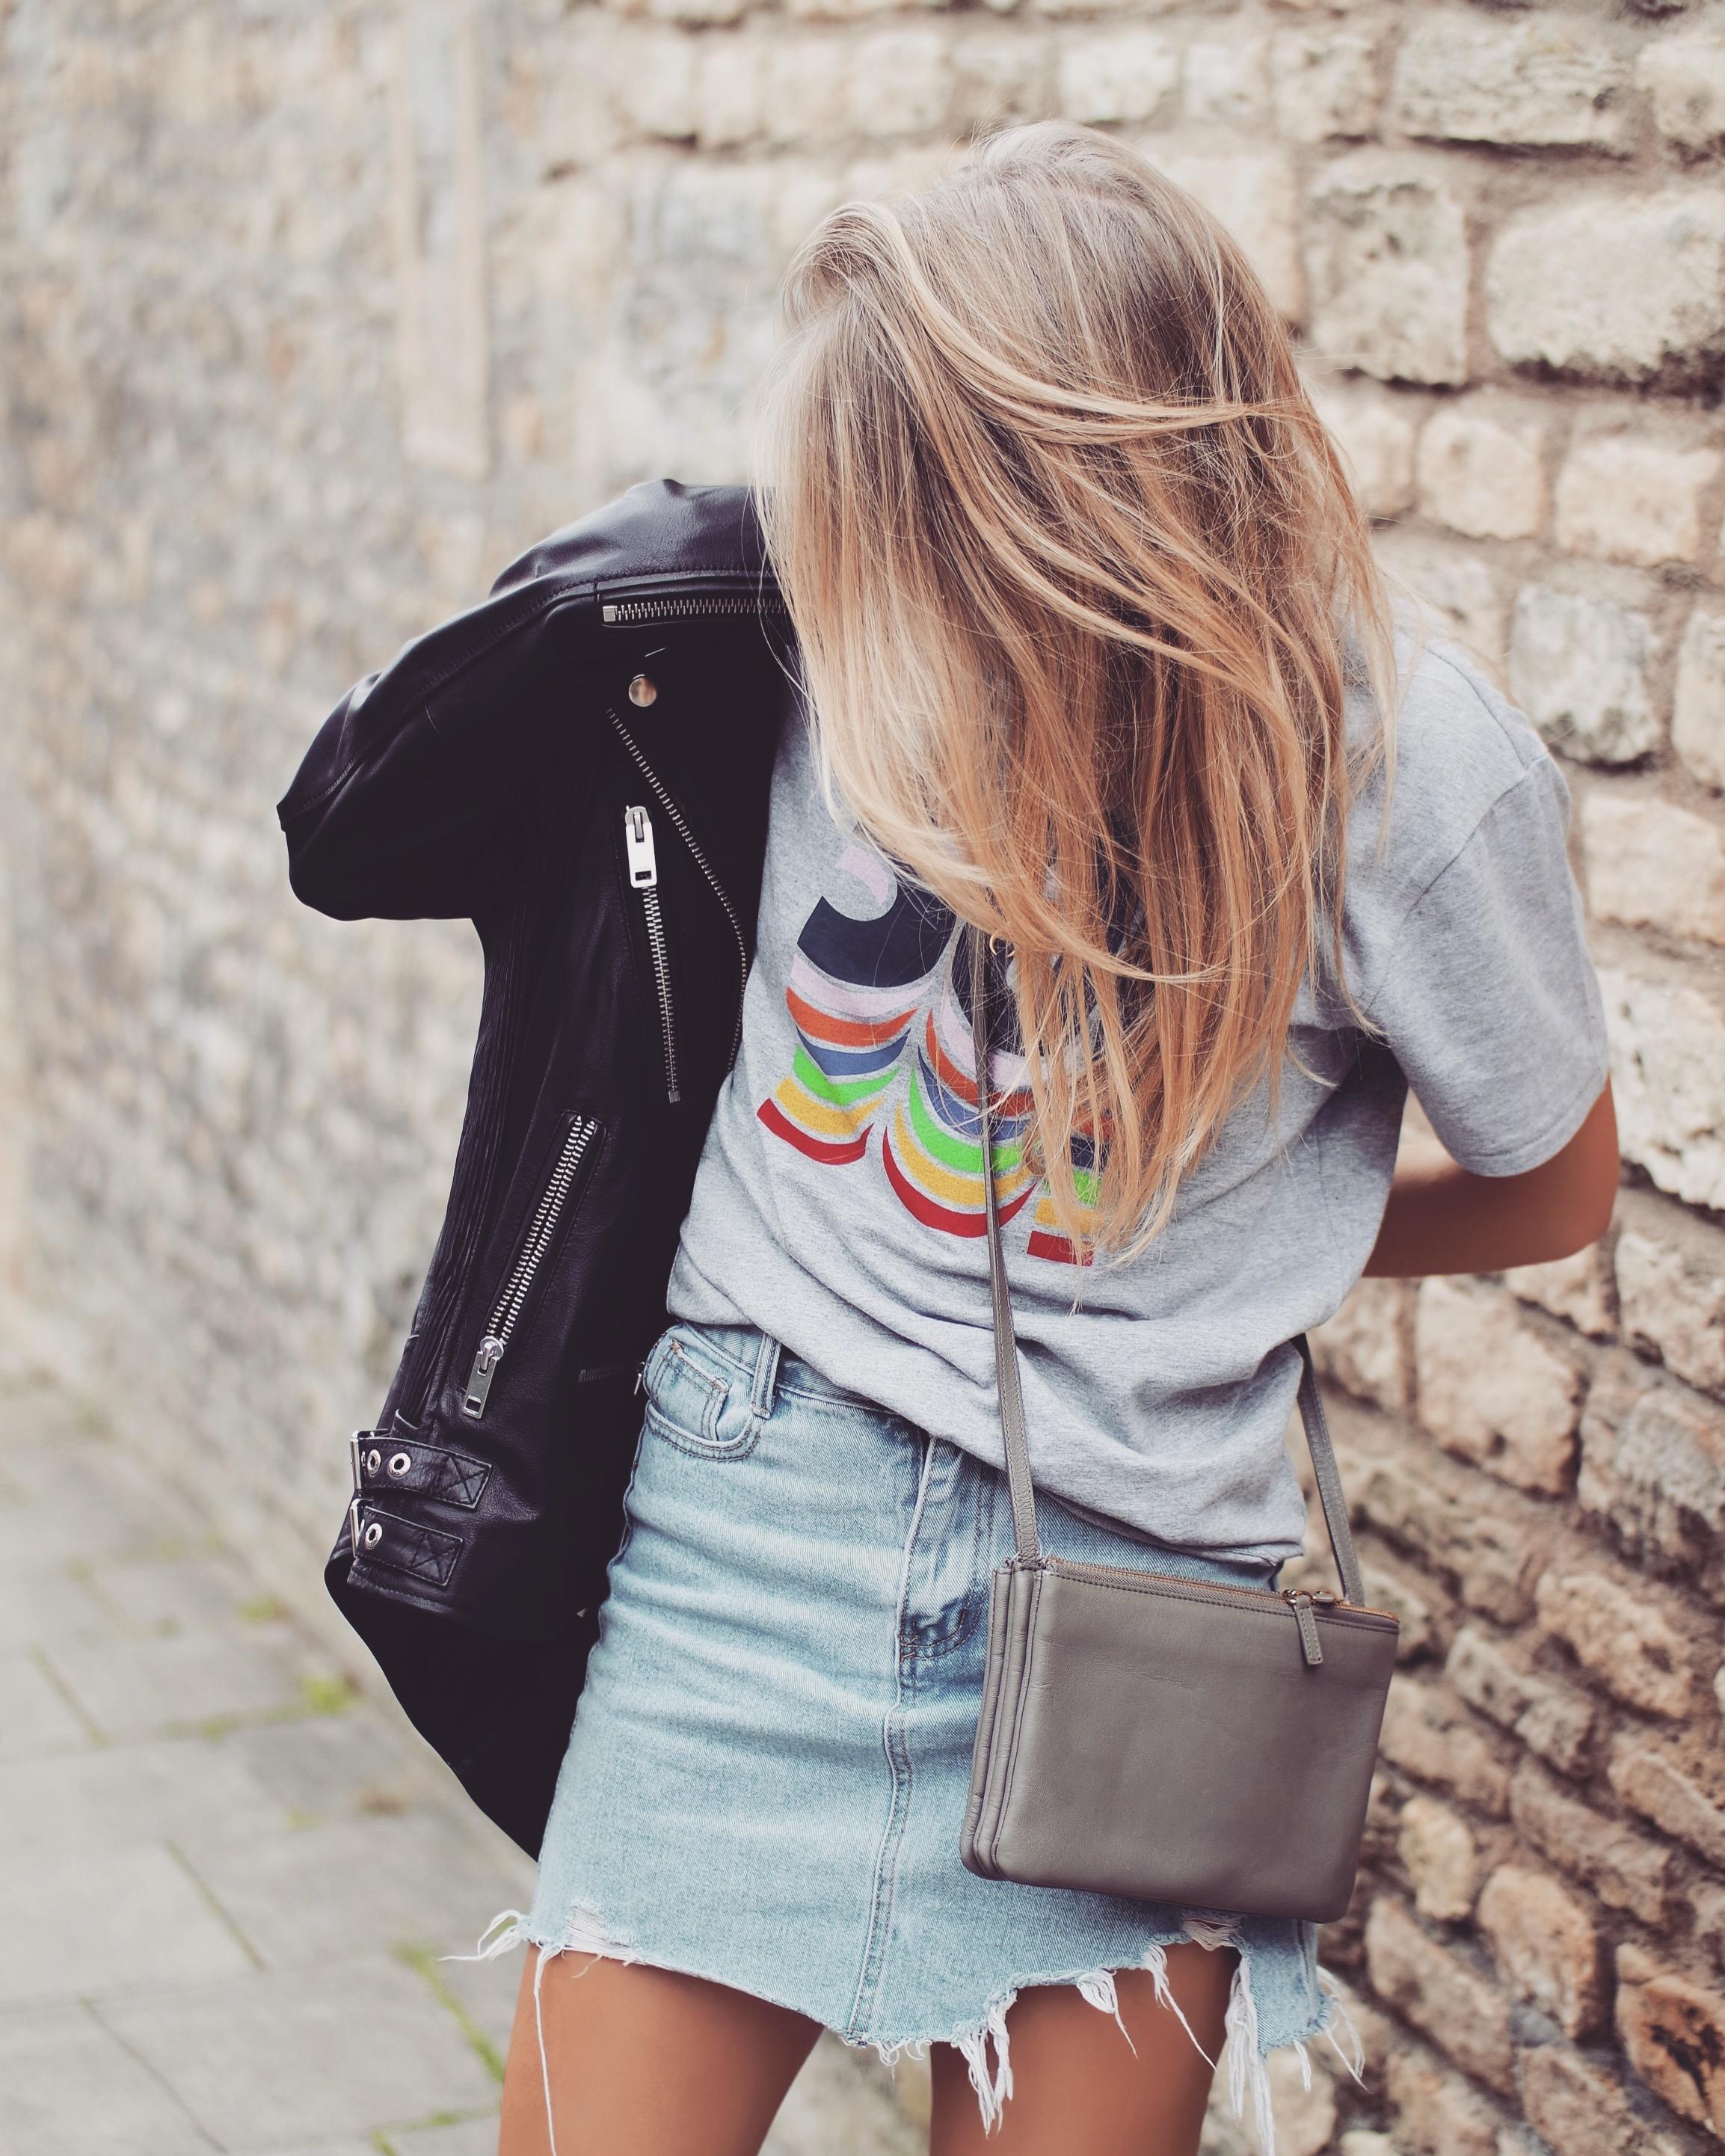 Leather Jacket - Vintage Denim Skirt